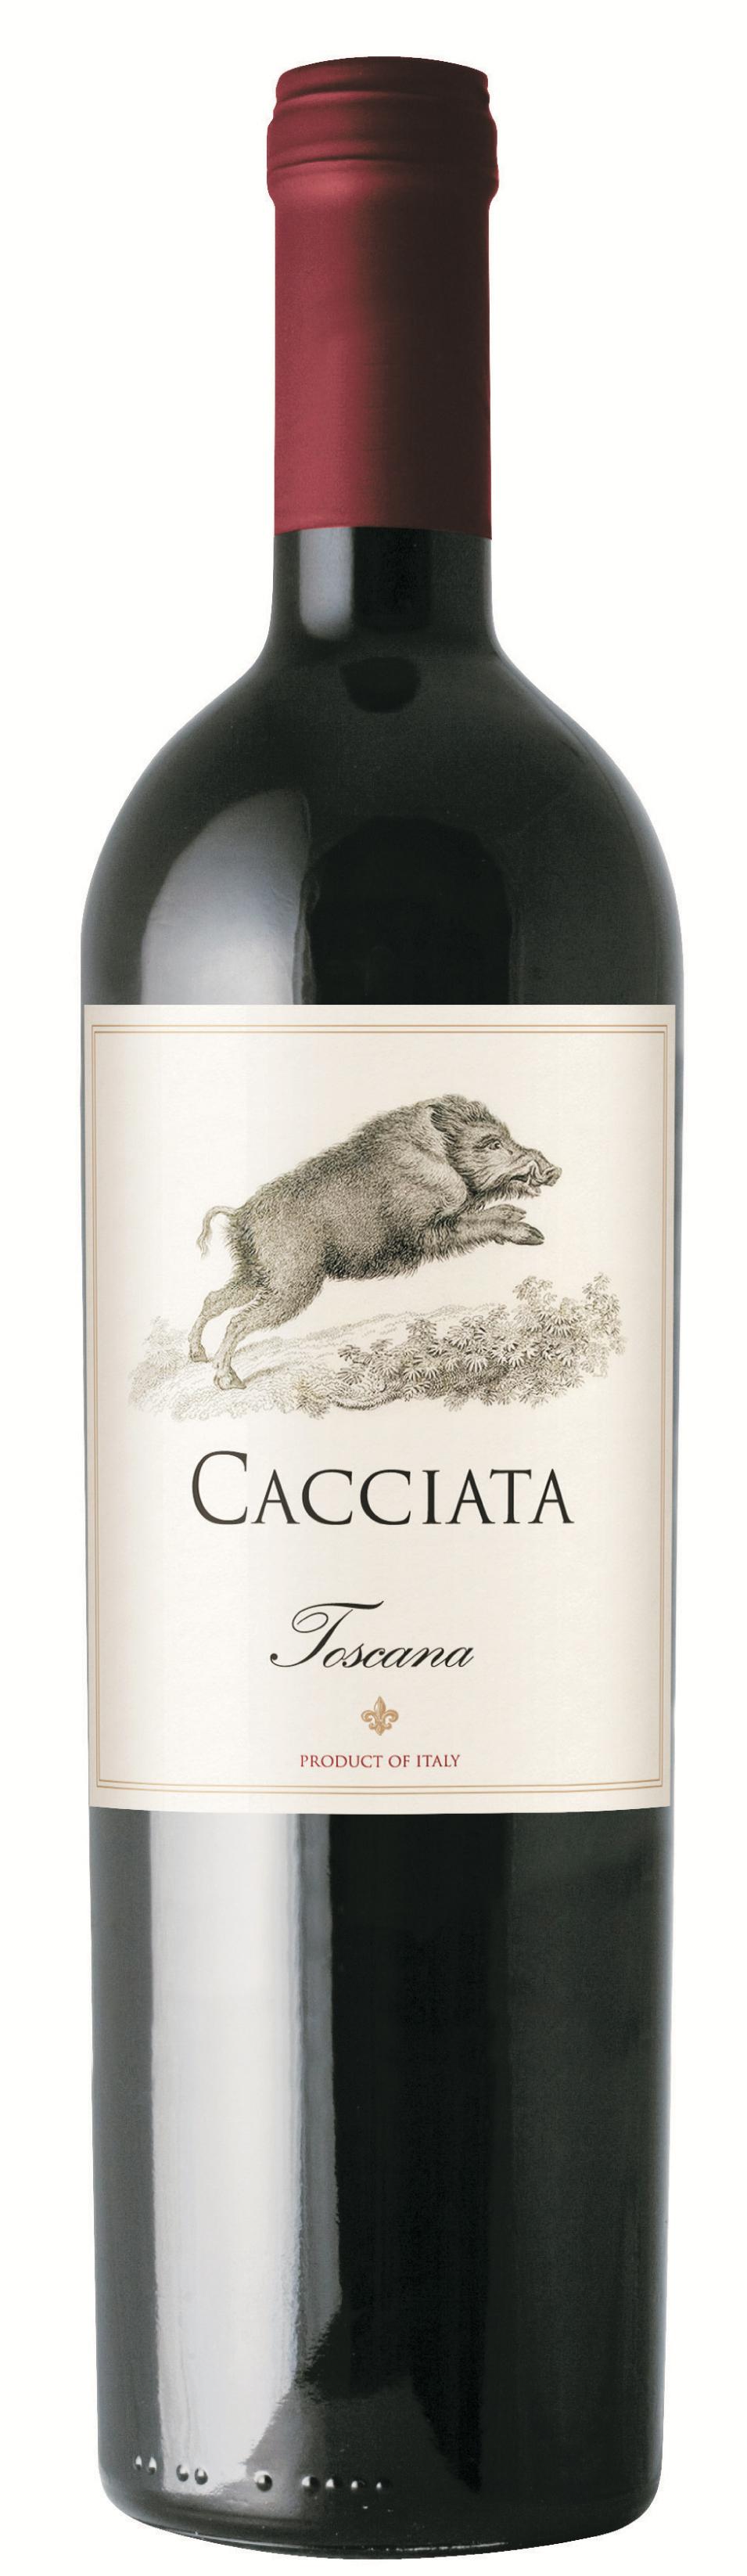 Cacciata_Toscana_bottle.jpg